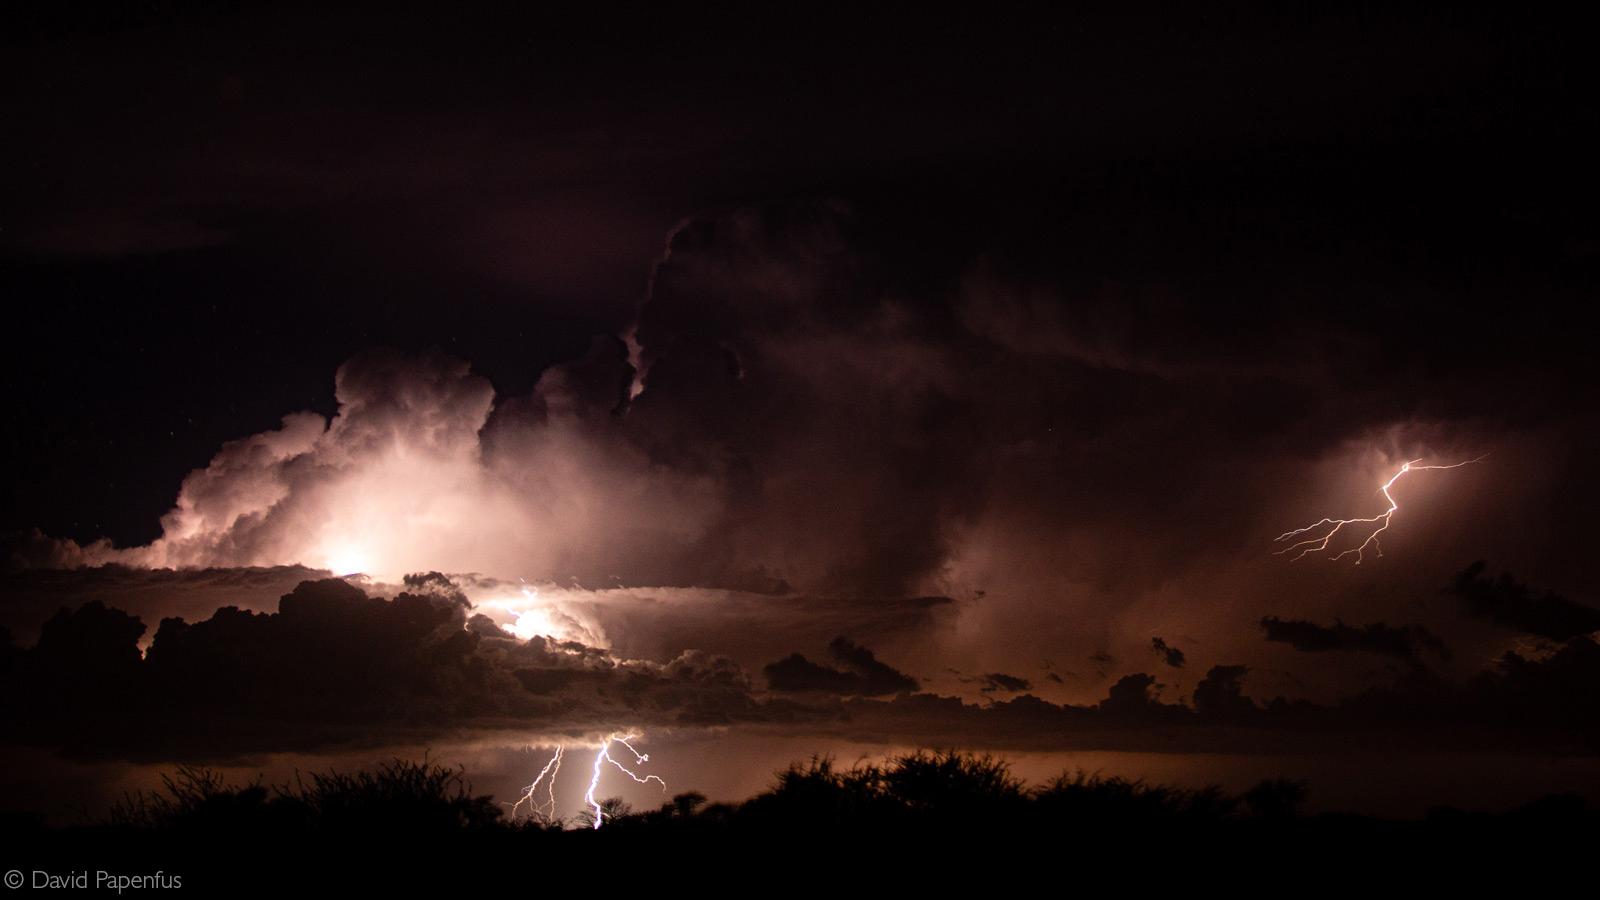 Distant thunderstorm. Kgalagadi Transfrontier Park, Botswana © David Papenfus